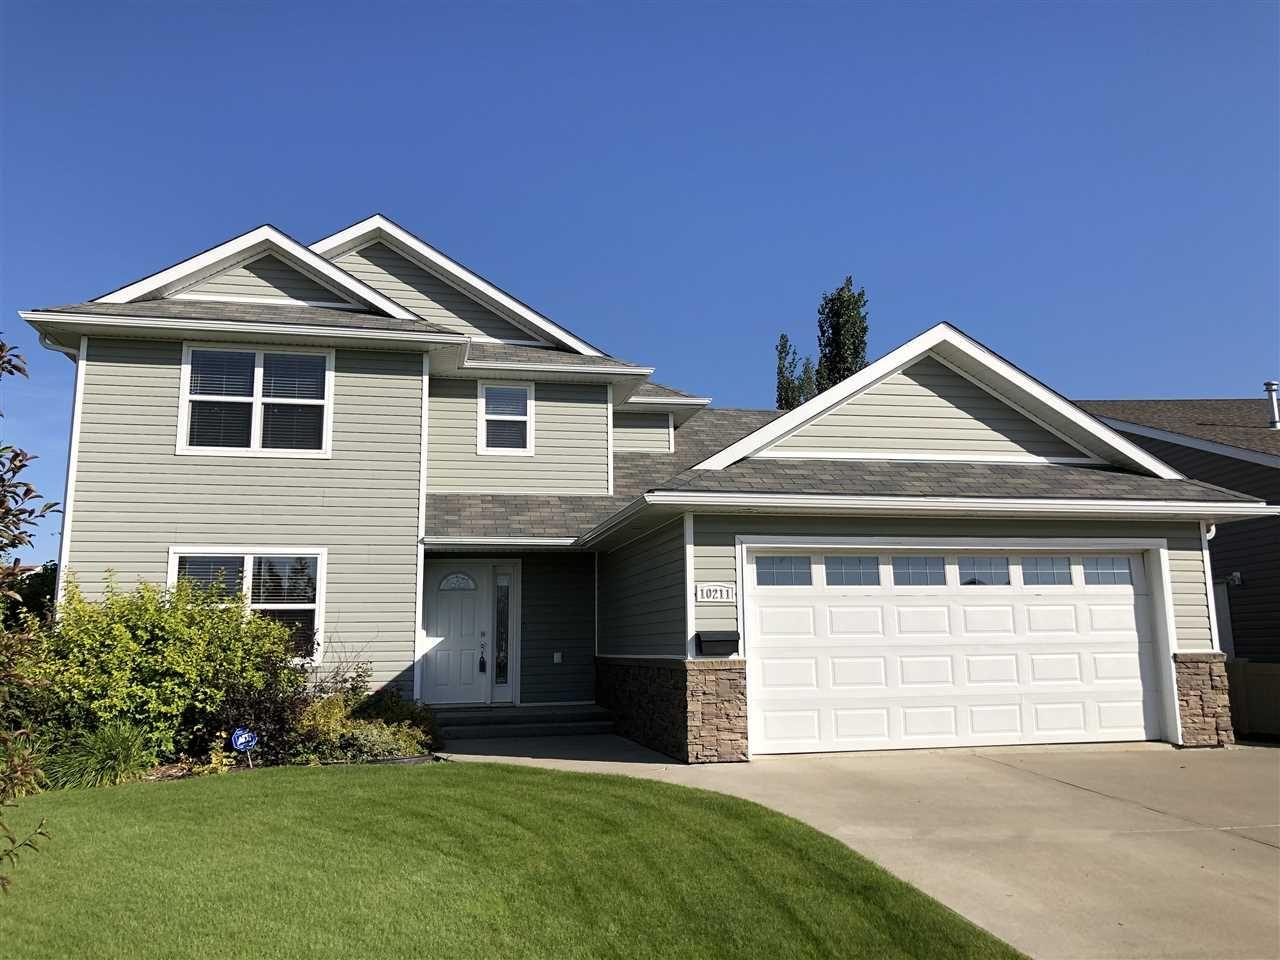 Main Photo: 10211 110A Avenue: Westlock House for sale : MLS®# E4228307